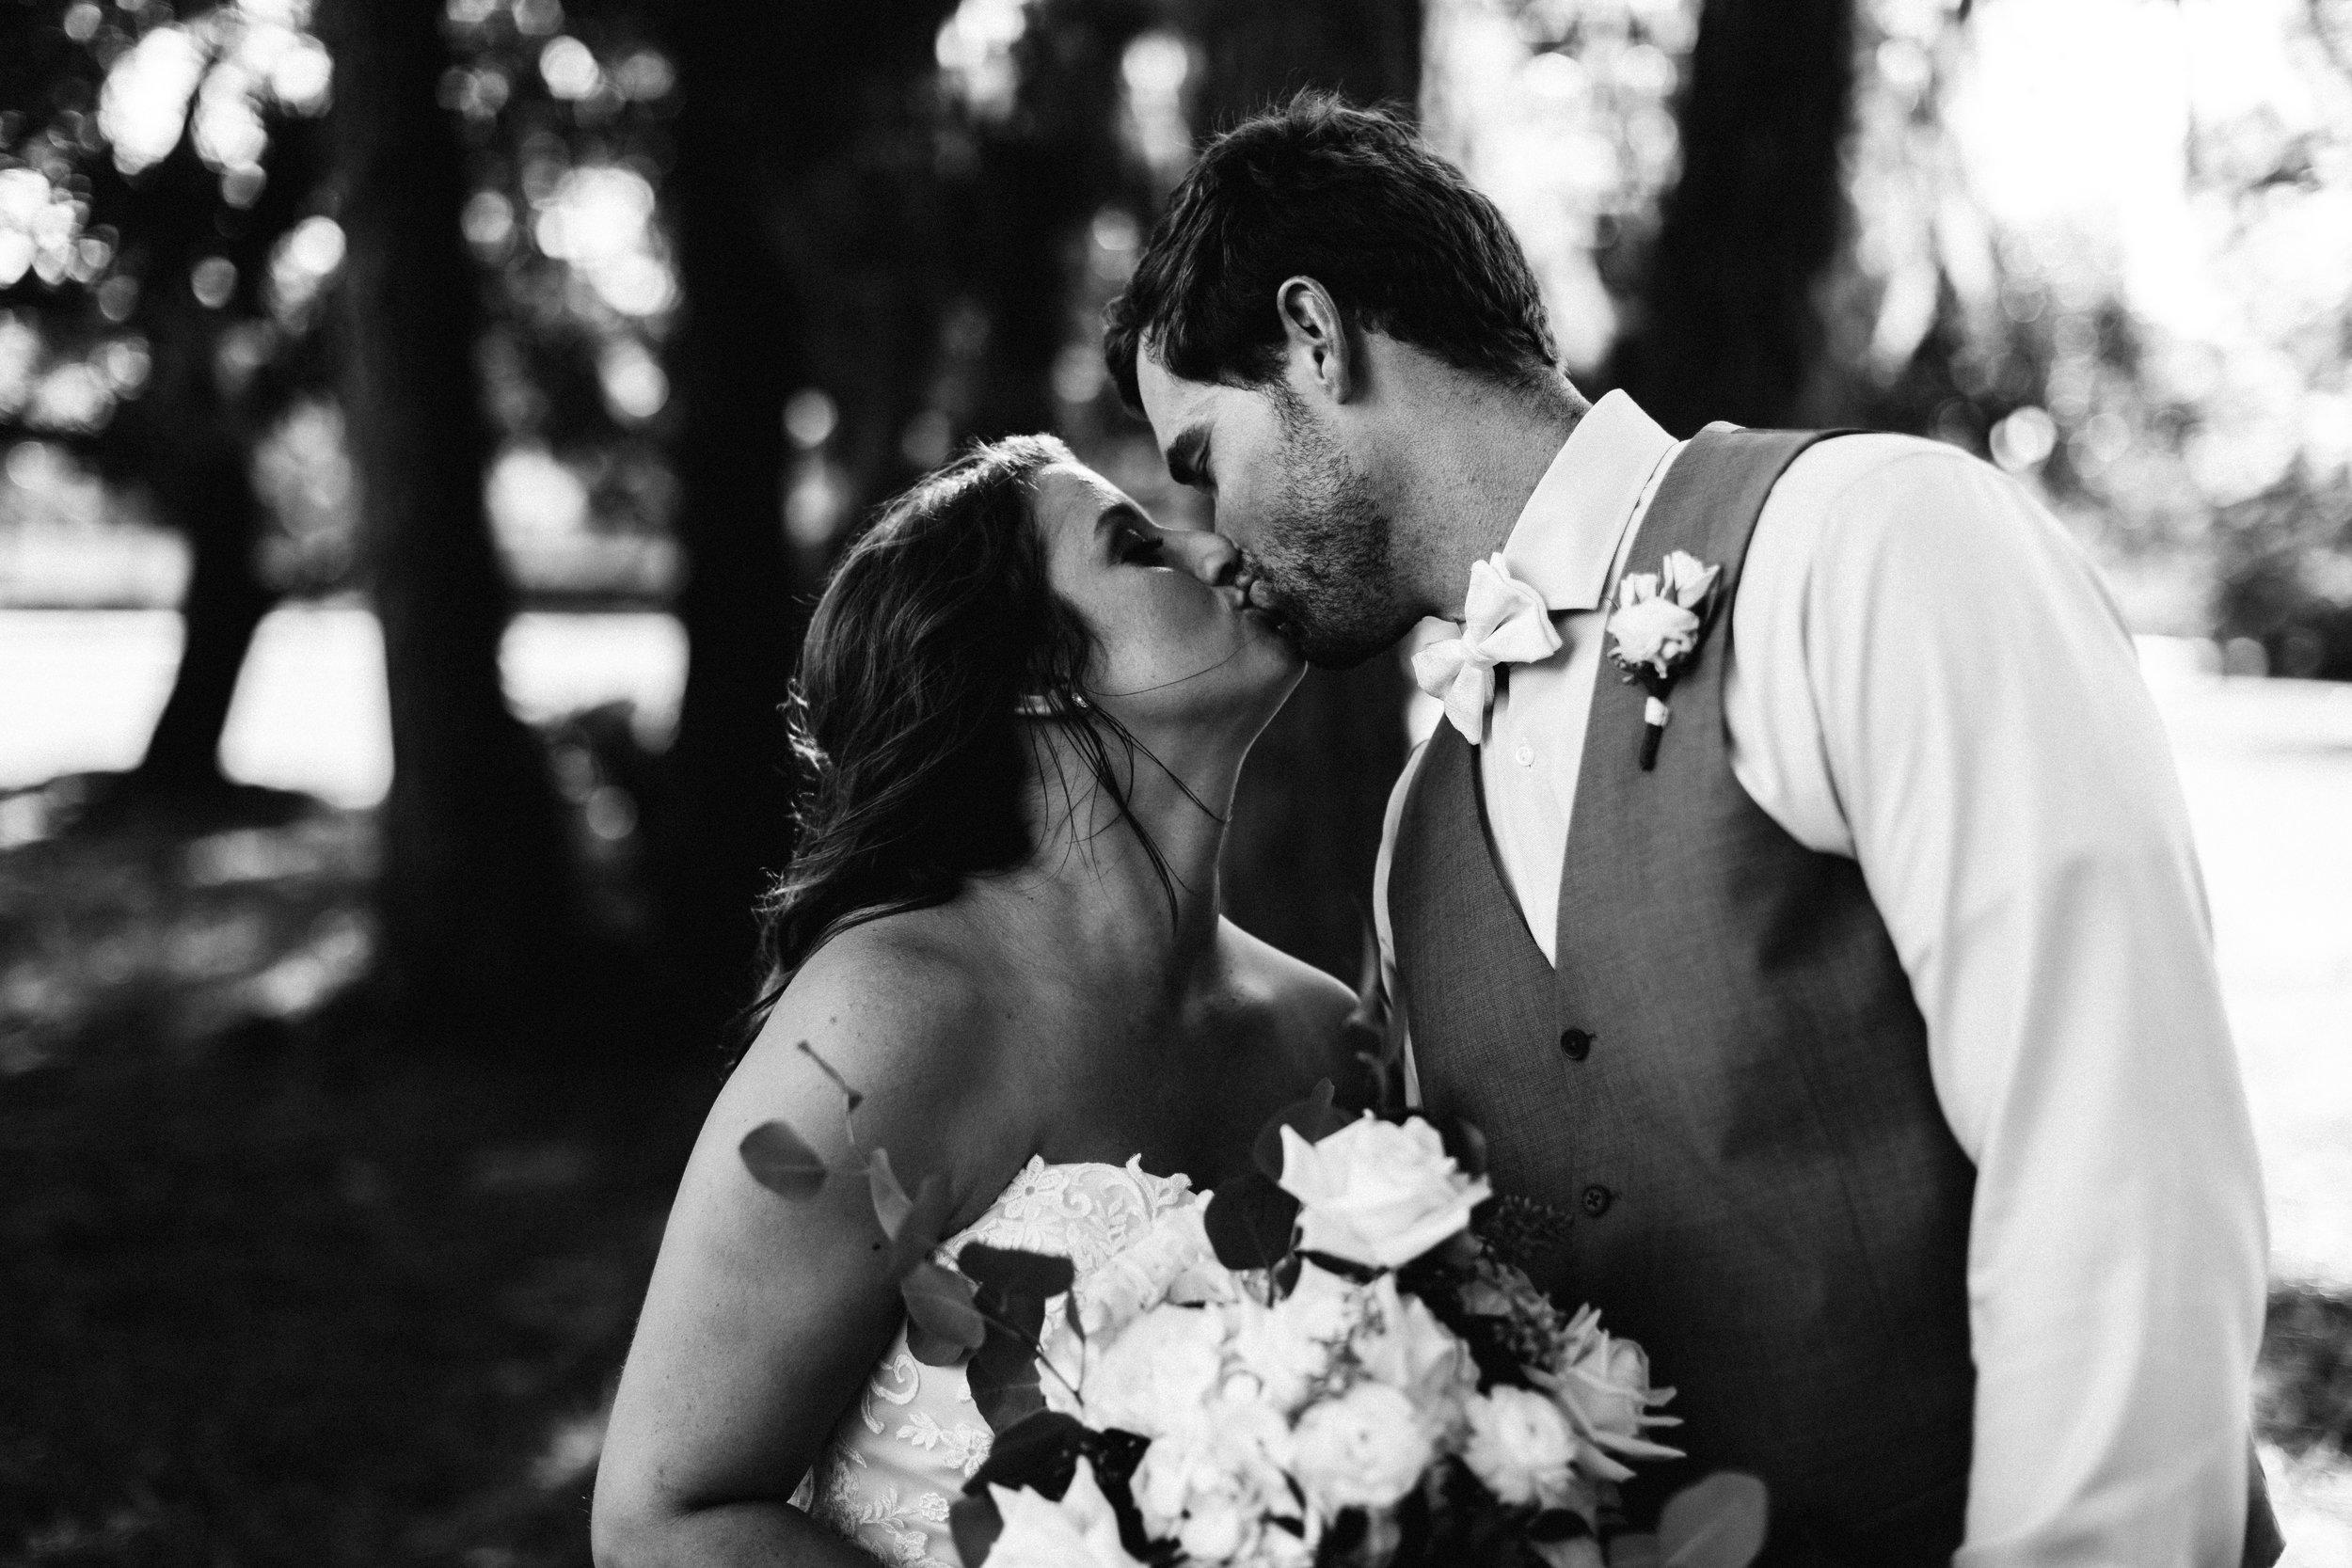 2017.10.14 Samantha and Matthew Crabtree Sarasota Wedding (353 of 708).jpg